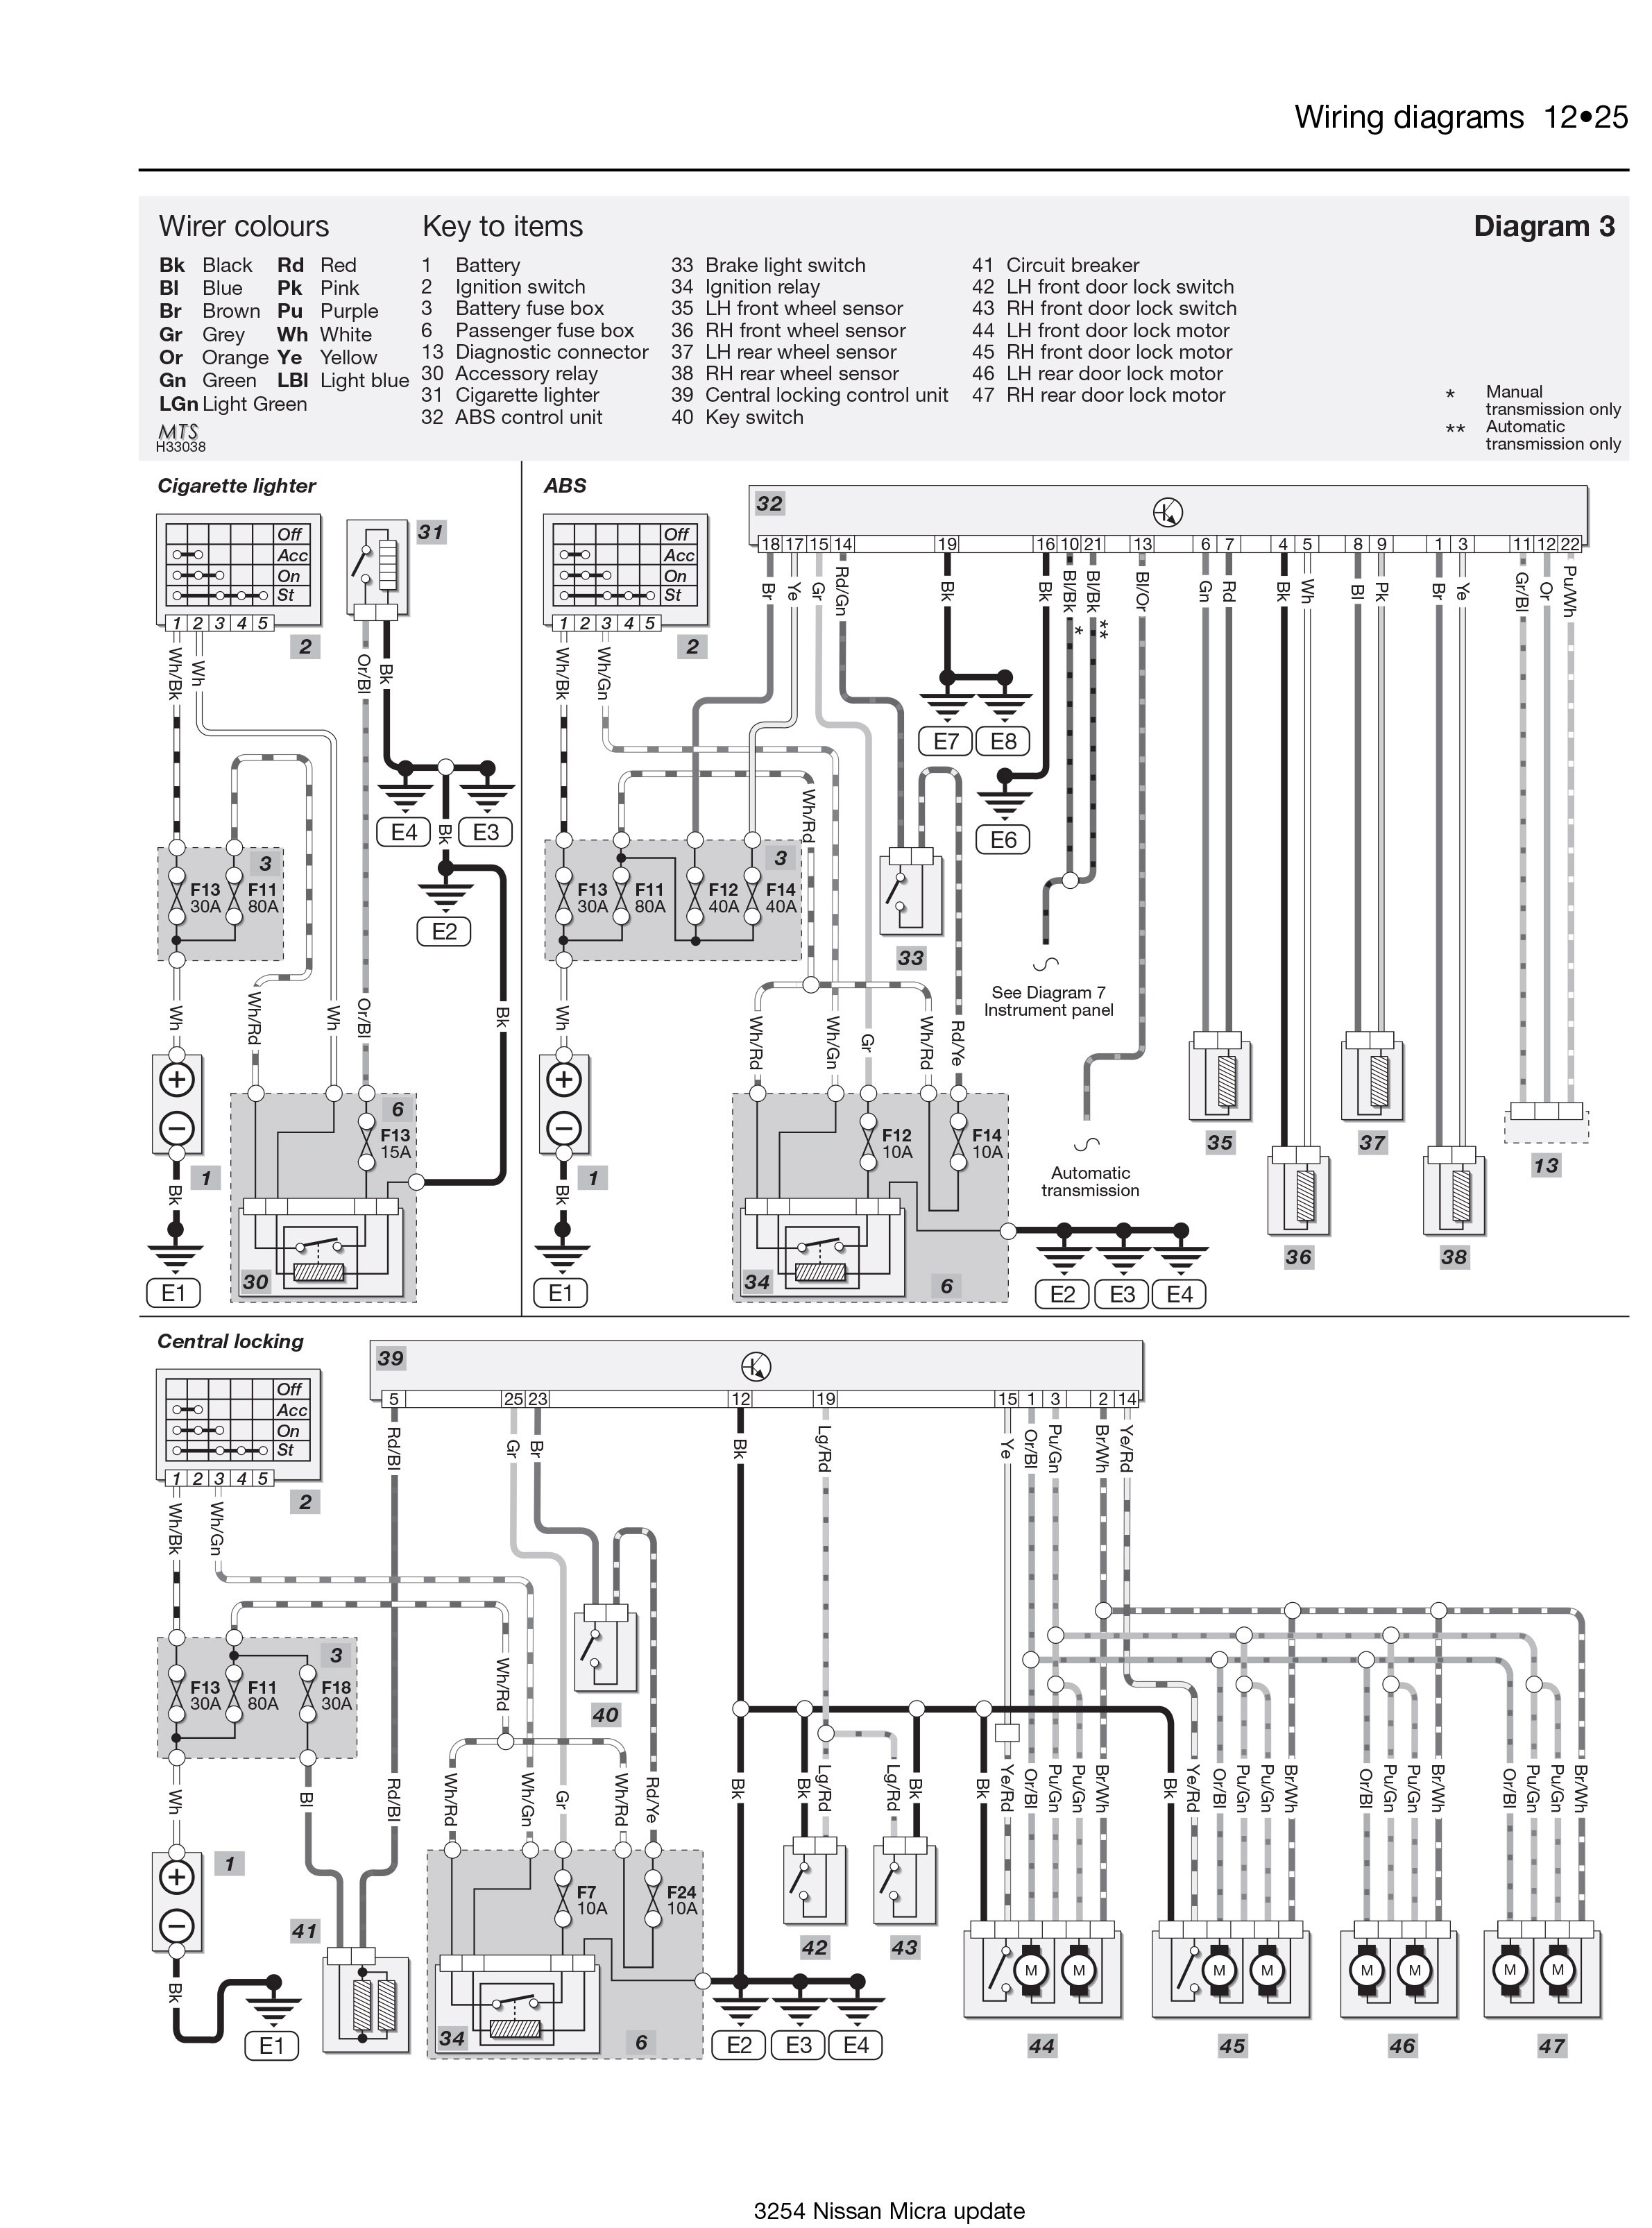 Nissan Micra Engine Diagram Nissan Micra 93 02 Haynes Repair Manual Of Nissan Micra Engine Diagram Beautiful Buick Wiring Diagrams Free Diagram